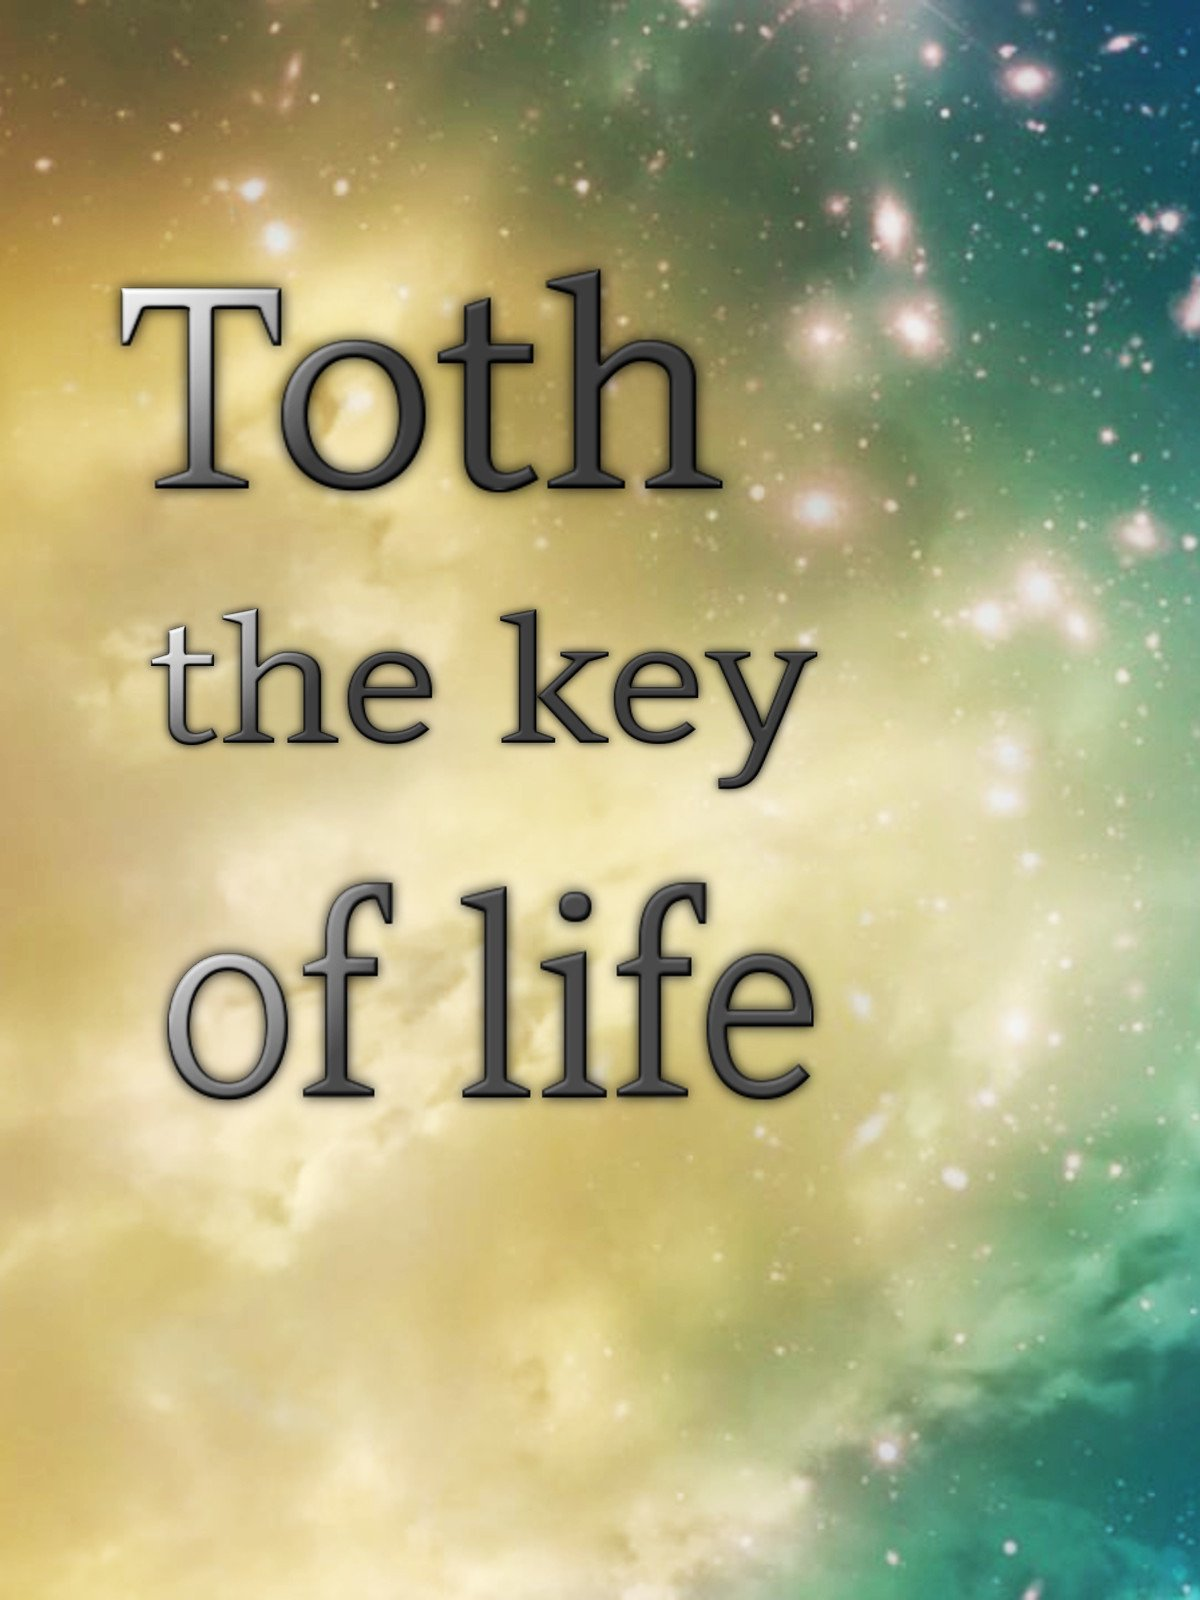 Thot, the key of life